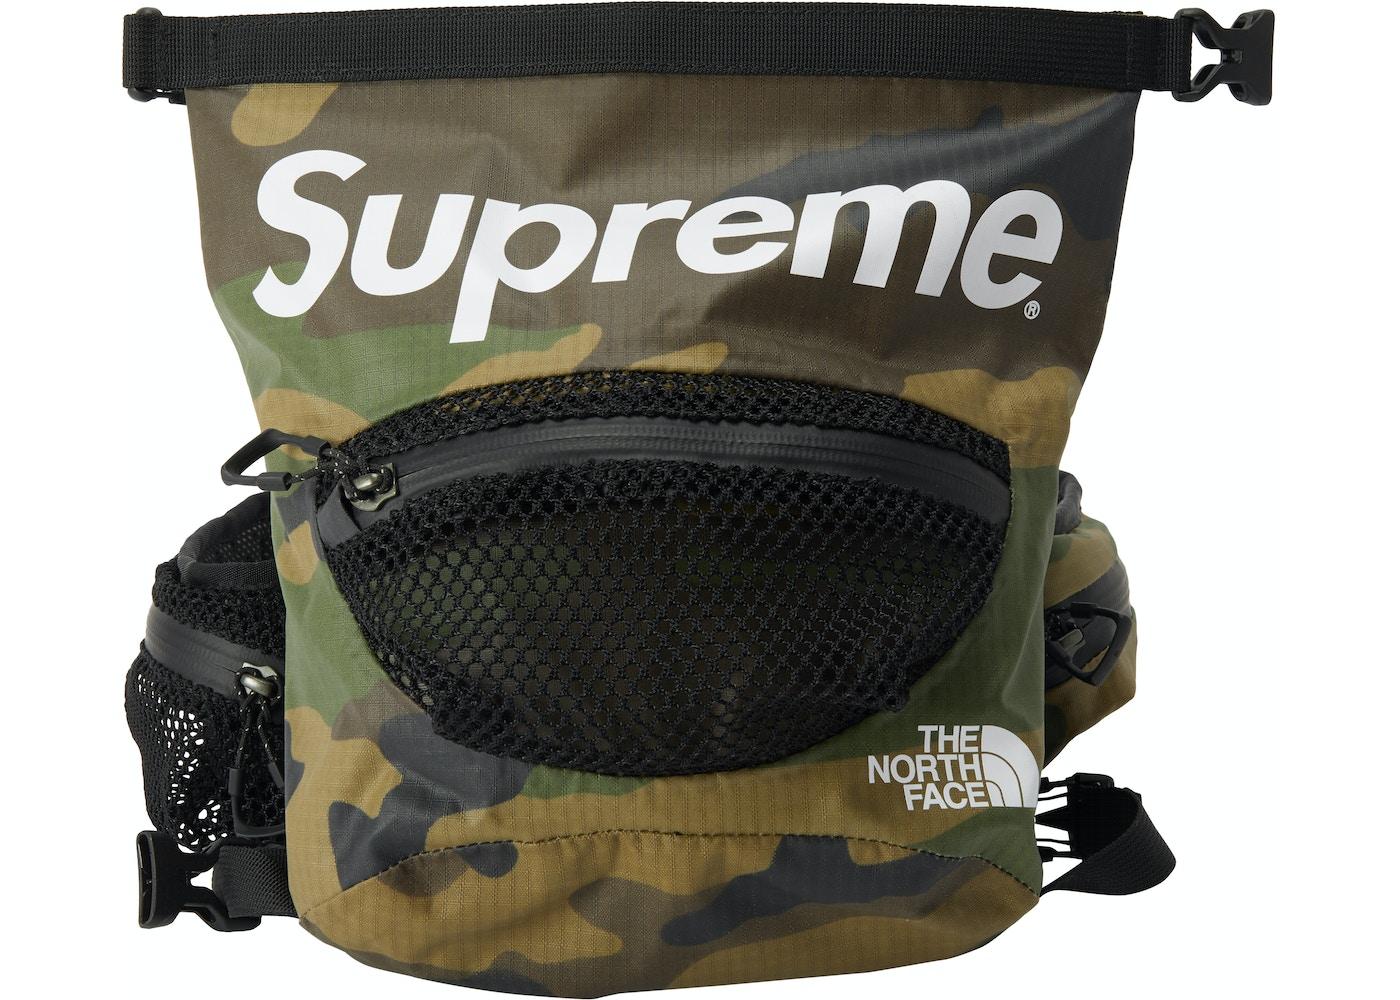 eefffbbc4 Supreme The North Face Waterproof Backpack Black - CEAGESP